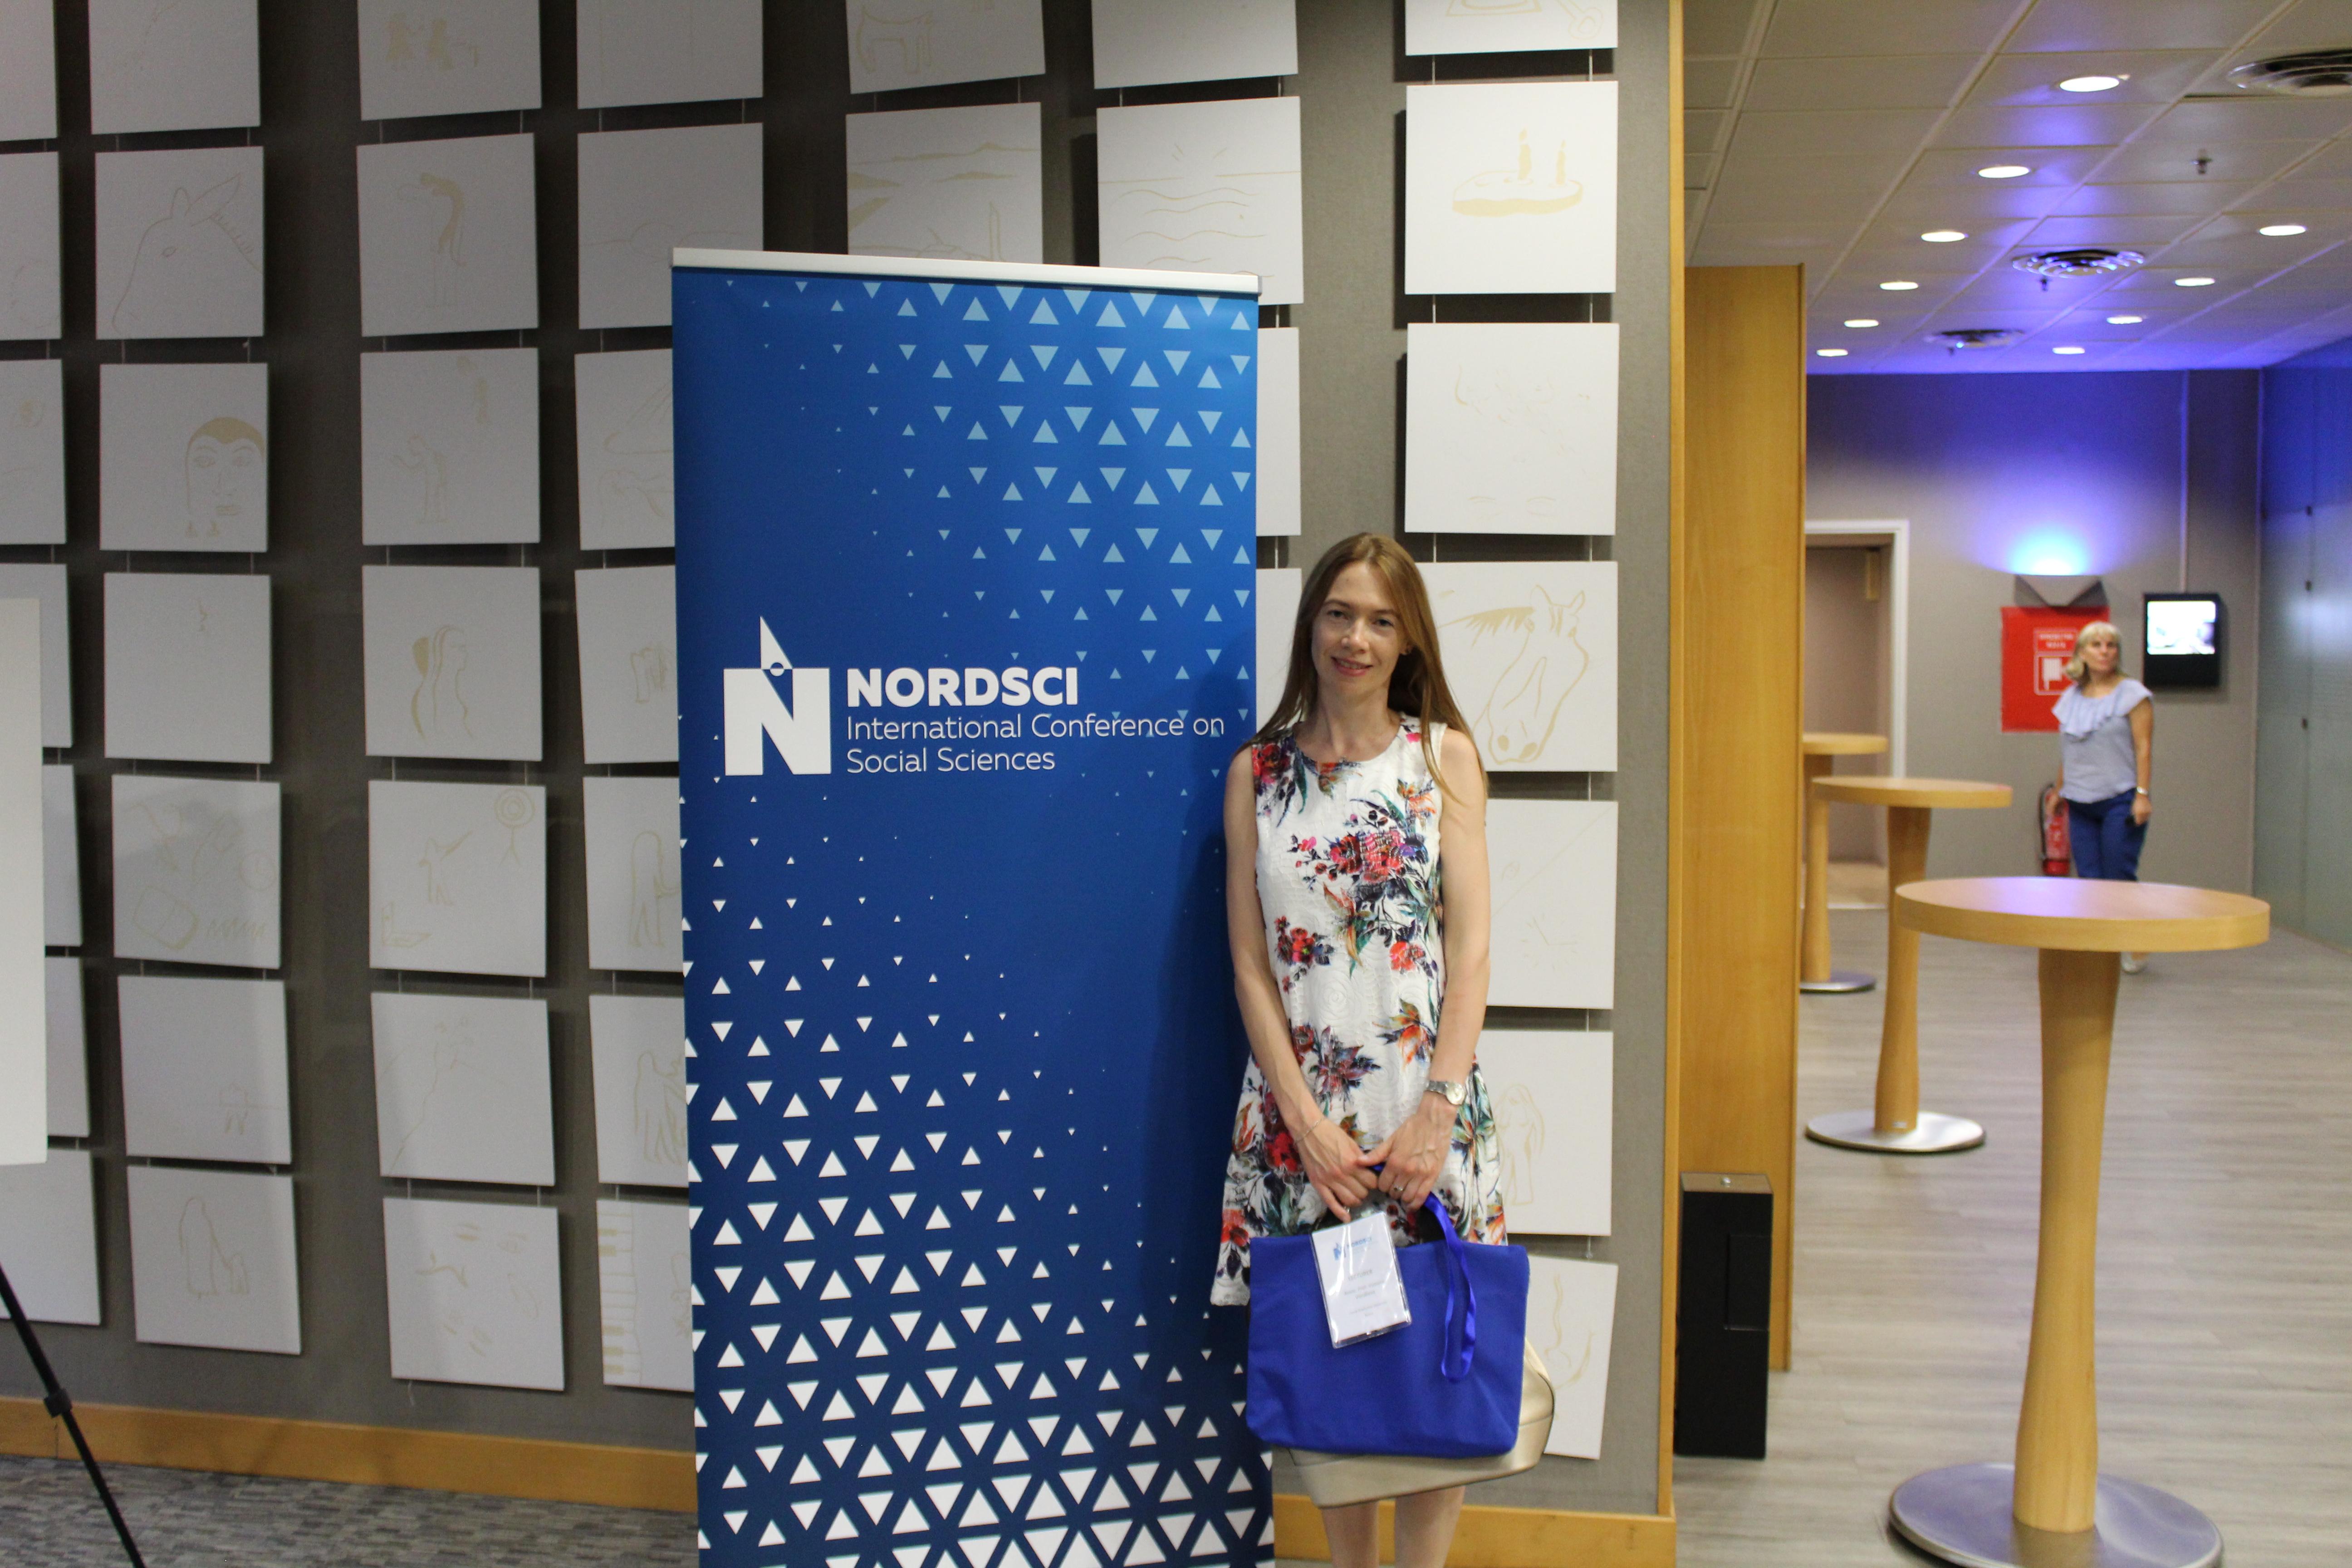 NORDSCI International Conference